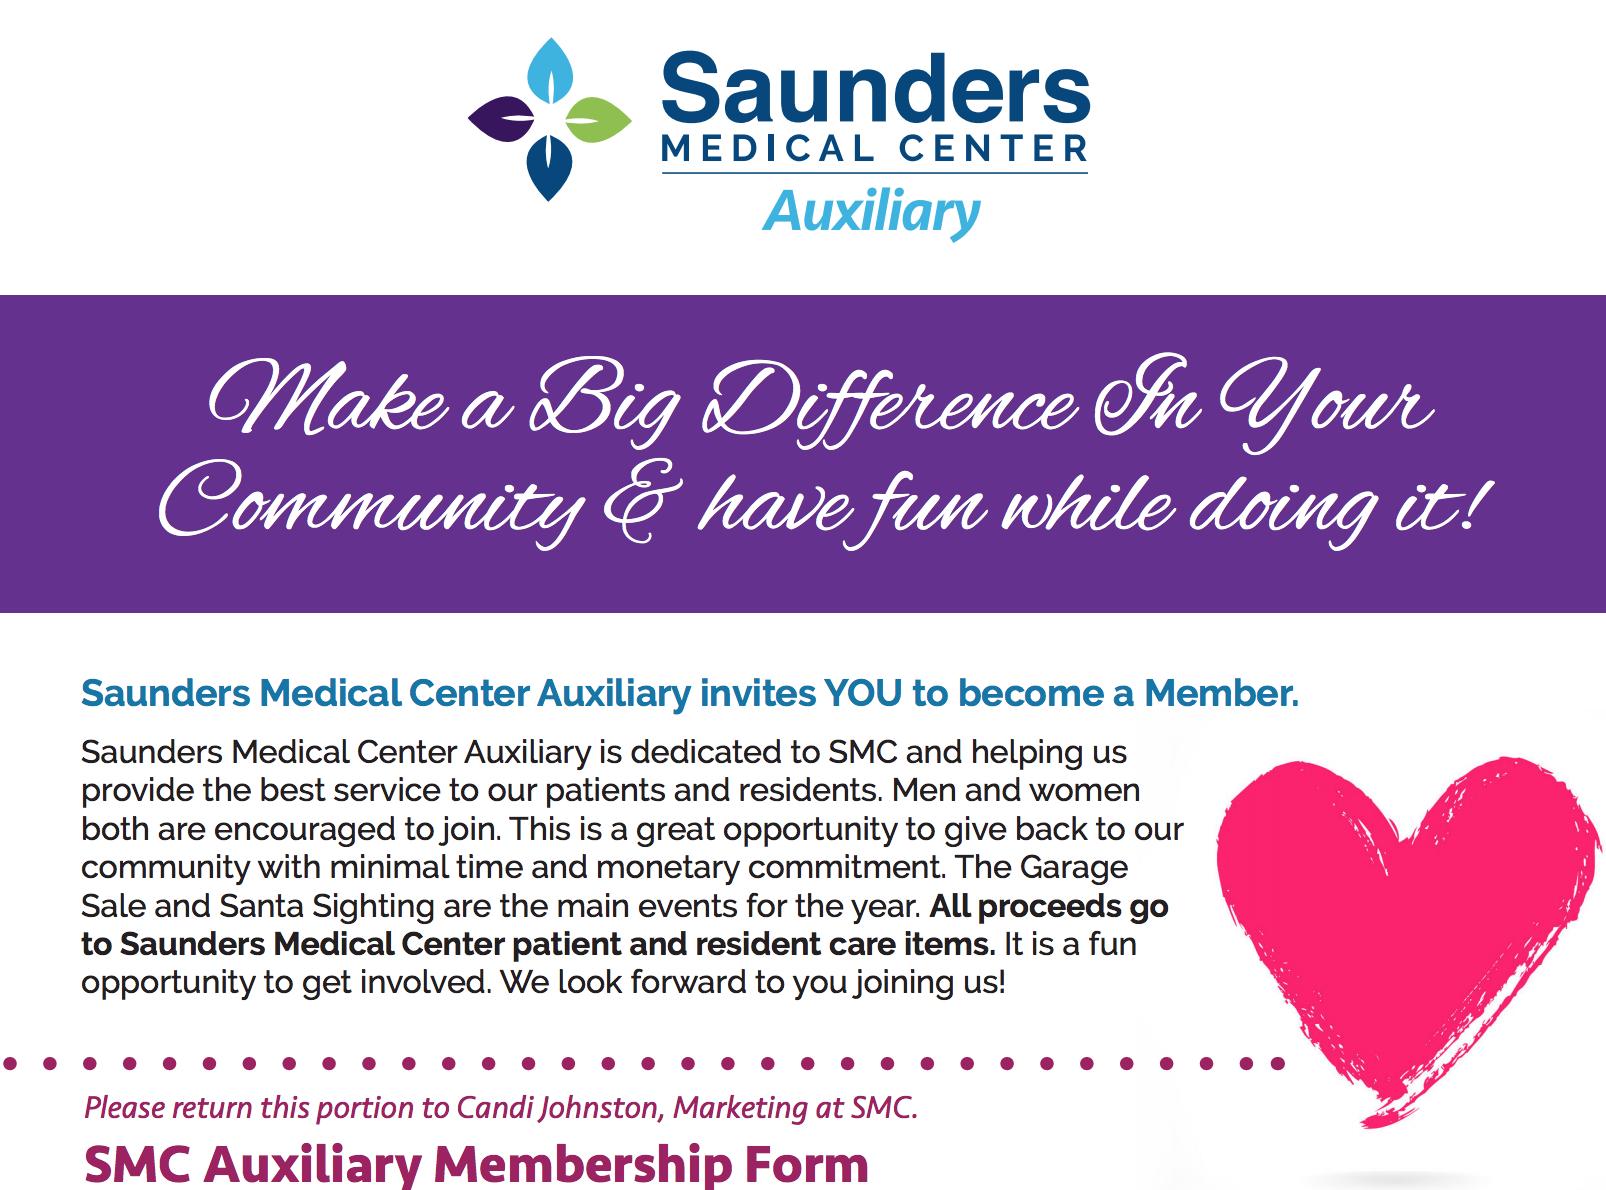 SMC Auxiliary Membership Form